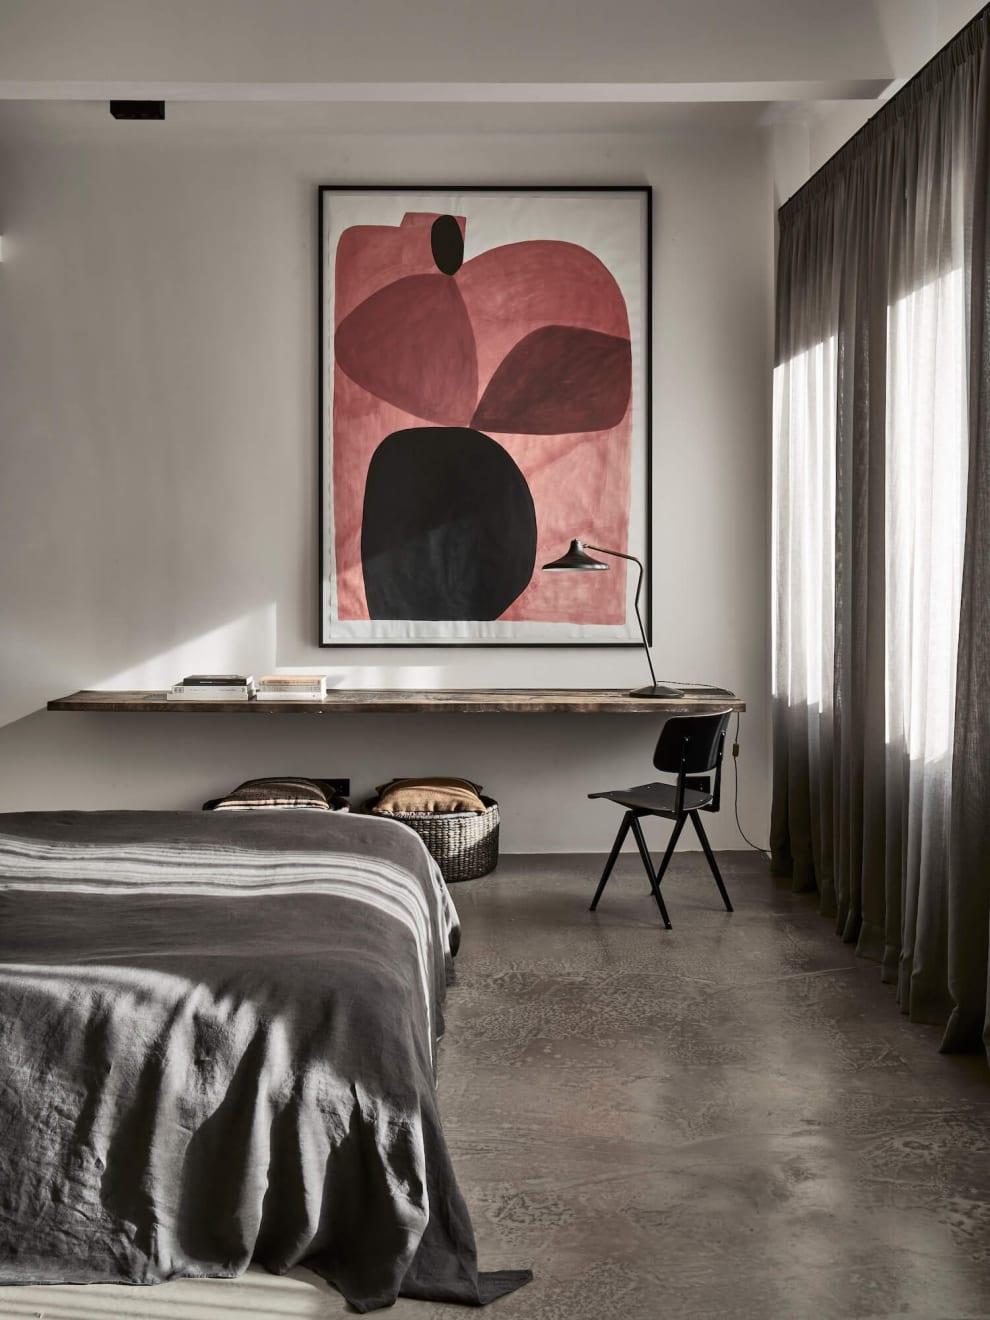 Caroline Denervaud No Ordinary Apartment by Interior Designer Annabell Kutucu. Photographed by Claus Brechenmacher.